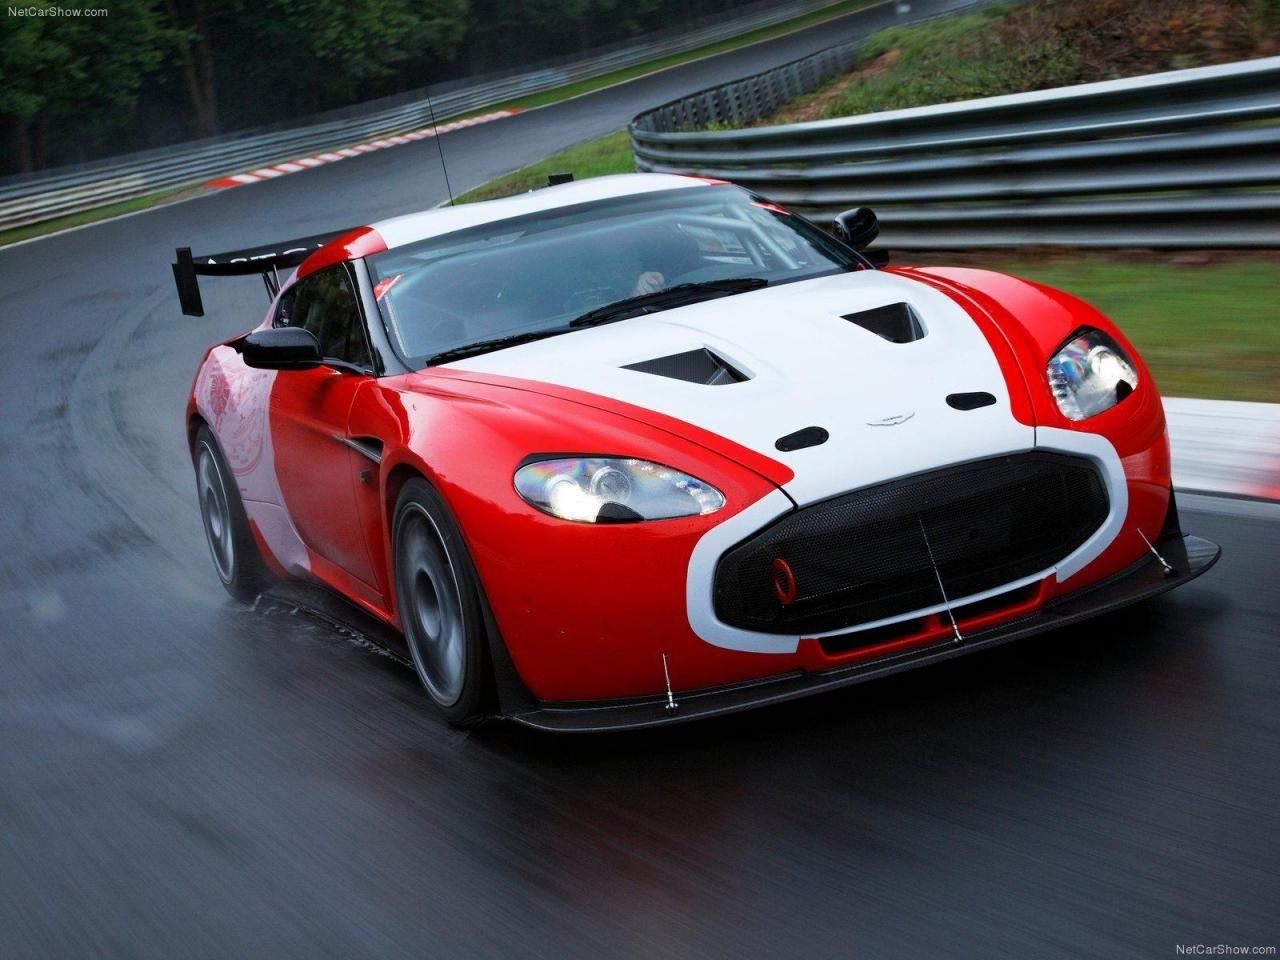 2011 Aston Martin V12 Zagato Racecar Aston Martin V12 Aston Martin Aston Martin Lagonda